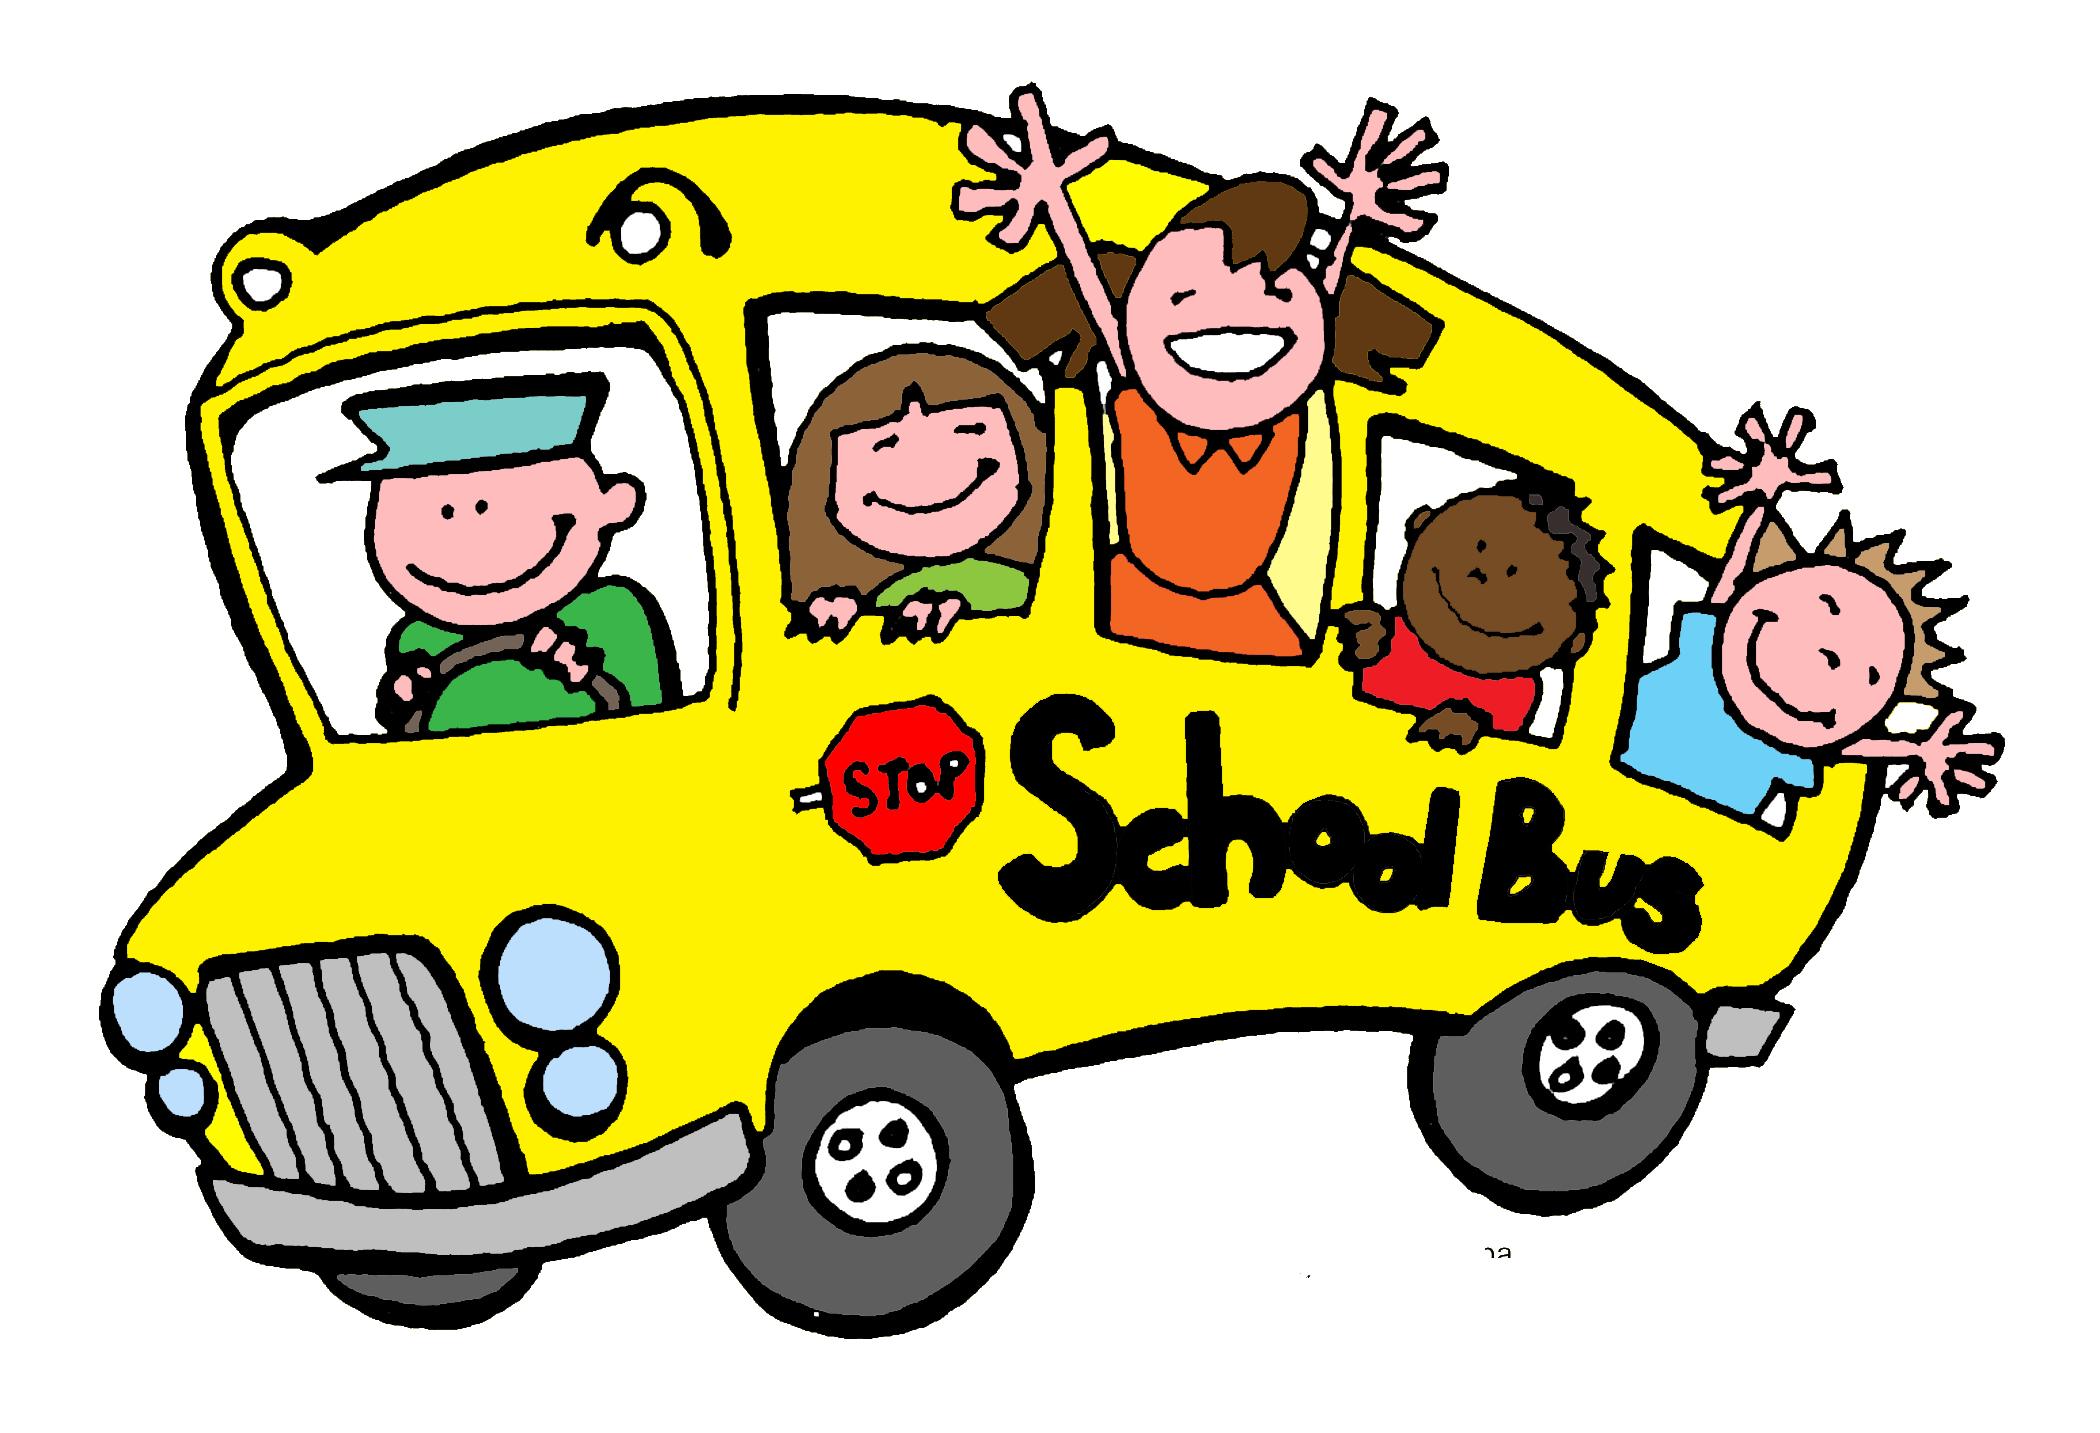 https://www.comune.nereto.te.it/images/scuolabus-colorato.png